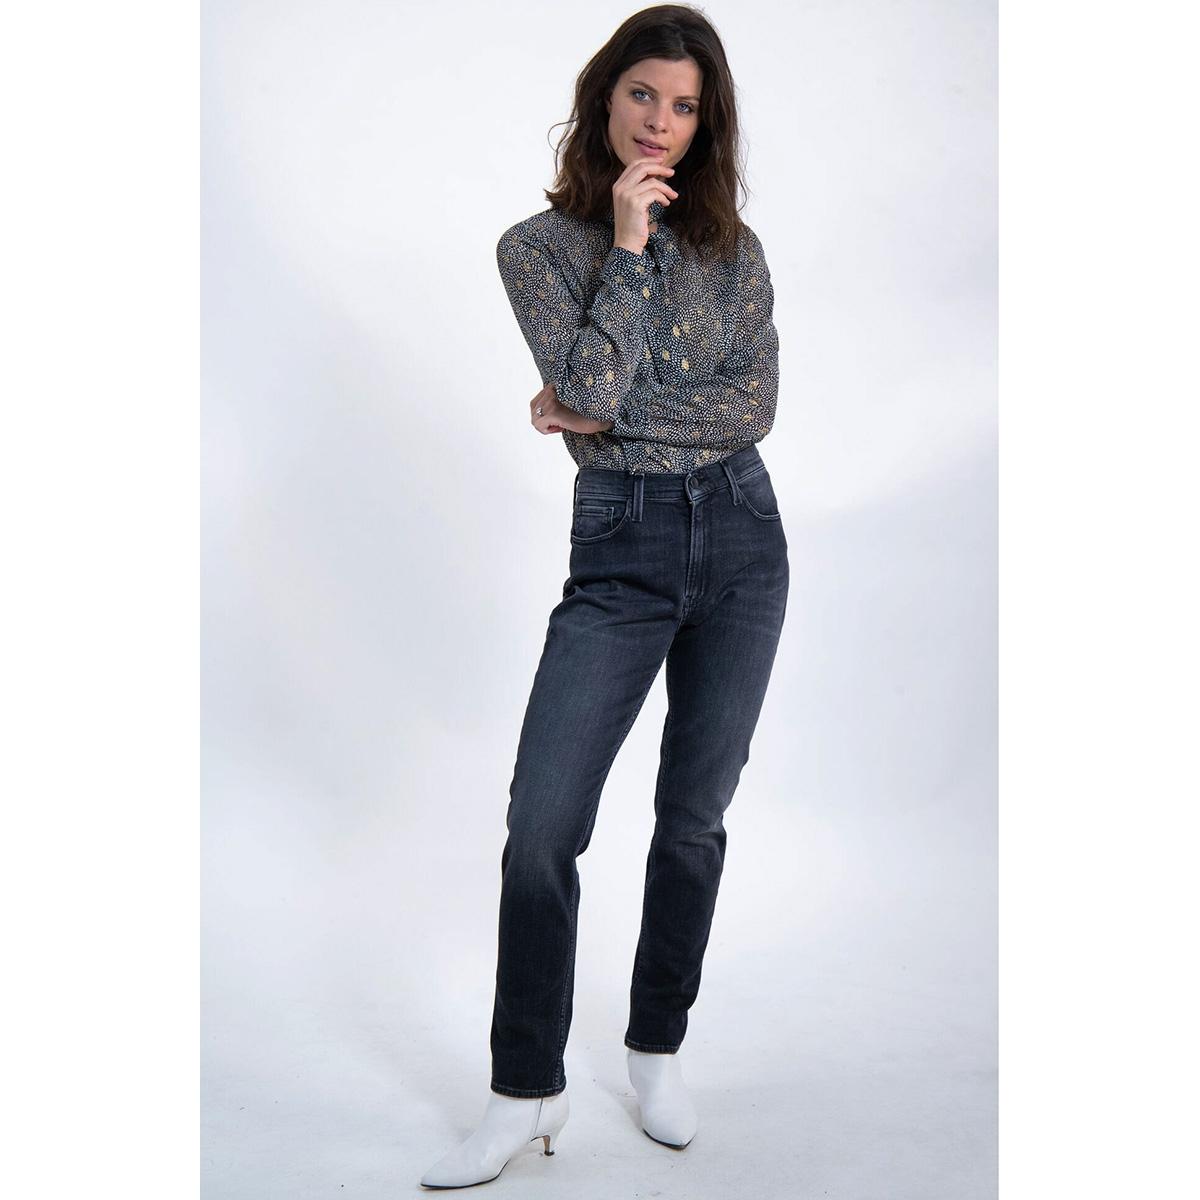 blouse met dubbele allover print ge901002 garcia blouse 60 black